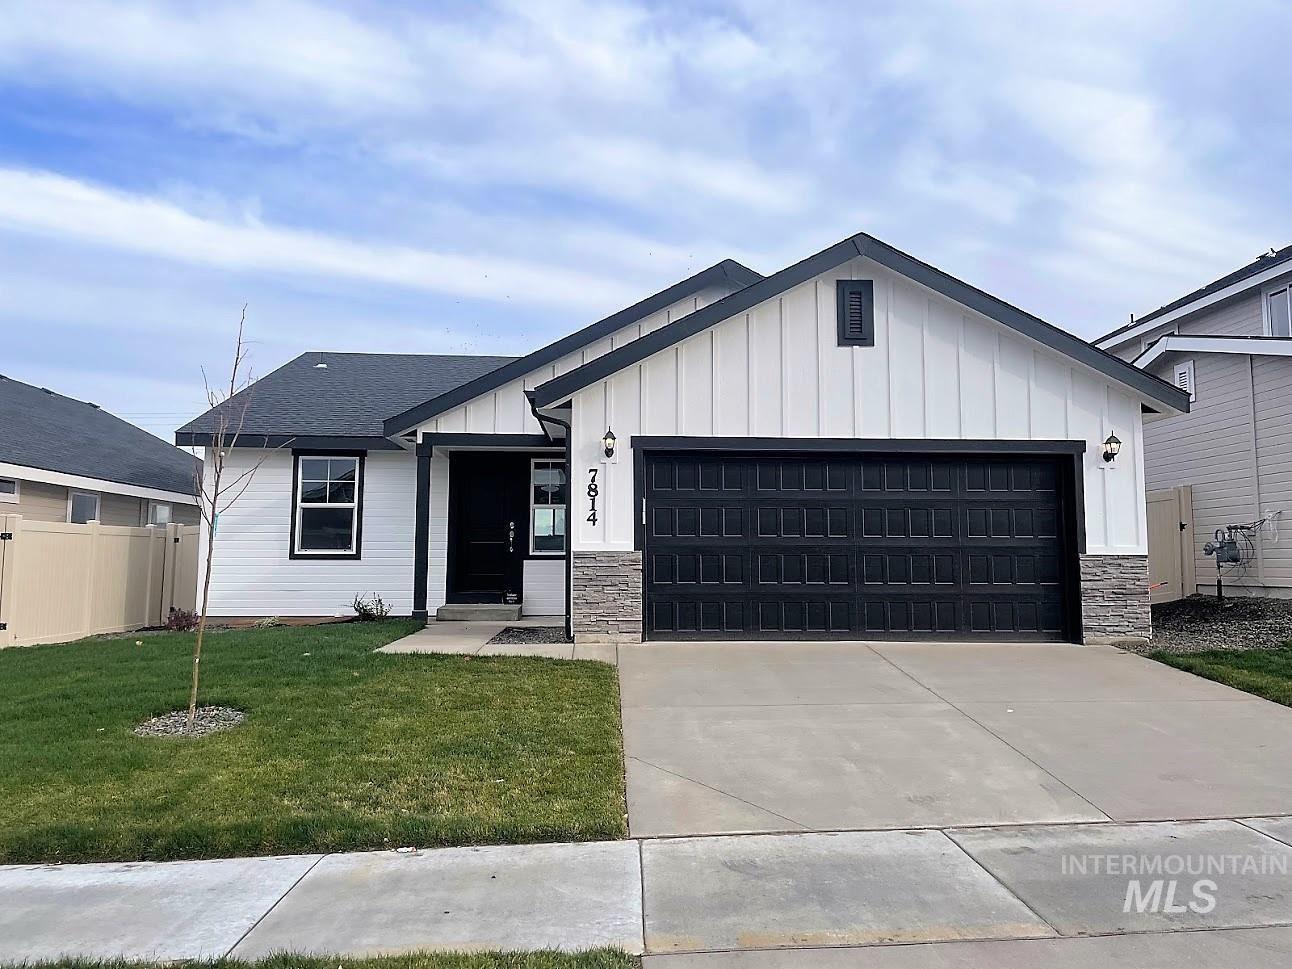 7814 S Boysenberry, Boise, ID 83709 - MLS#: 98810037